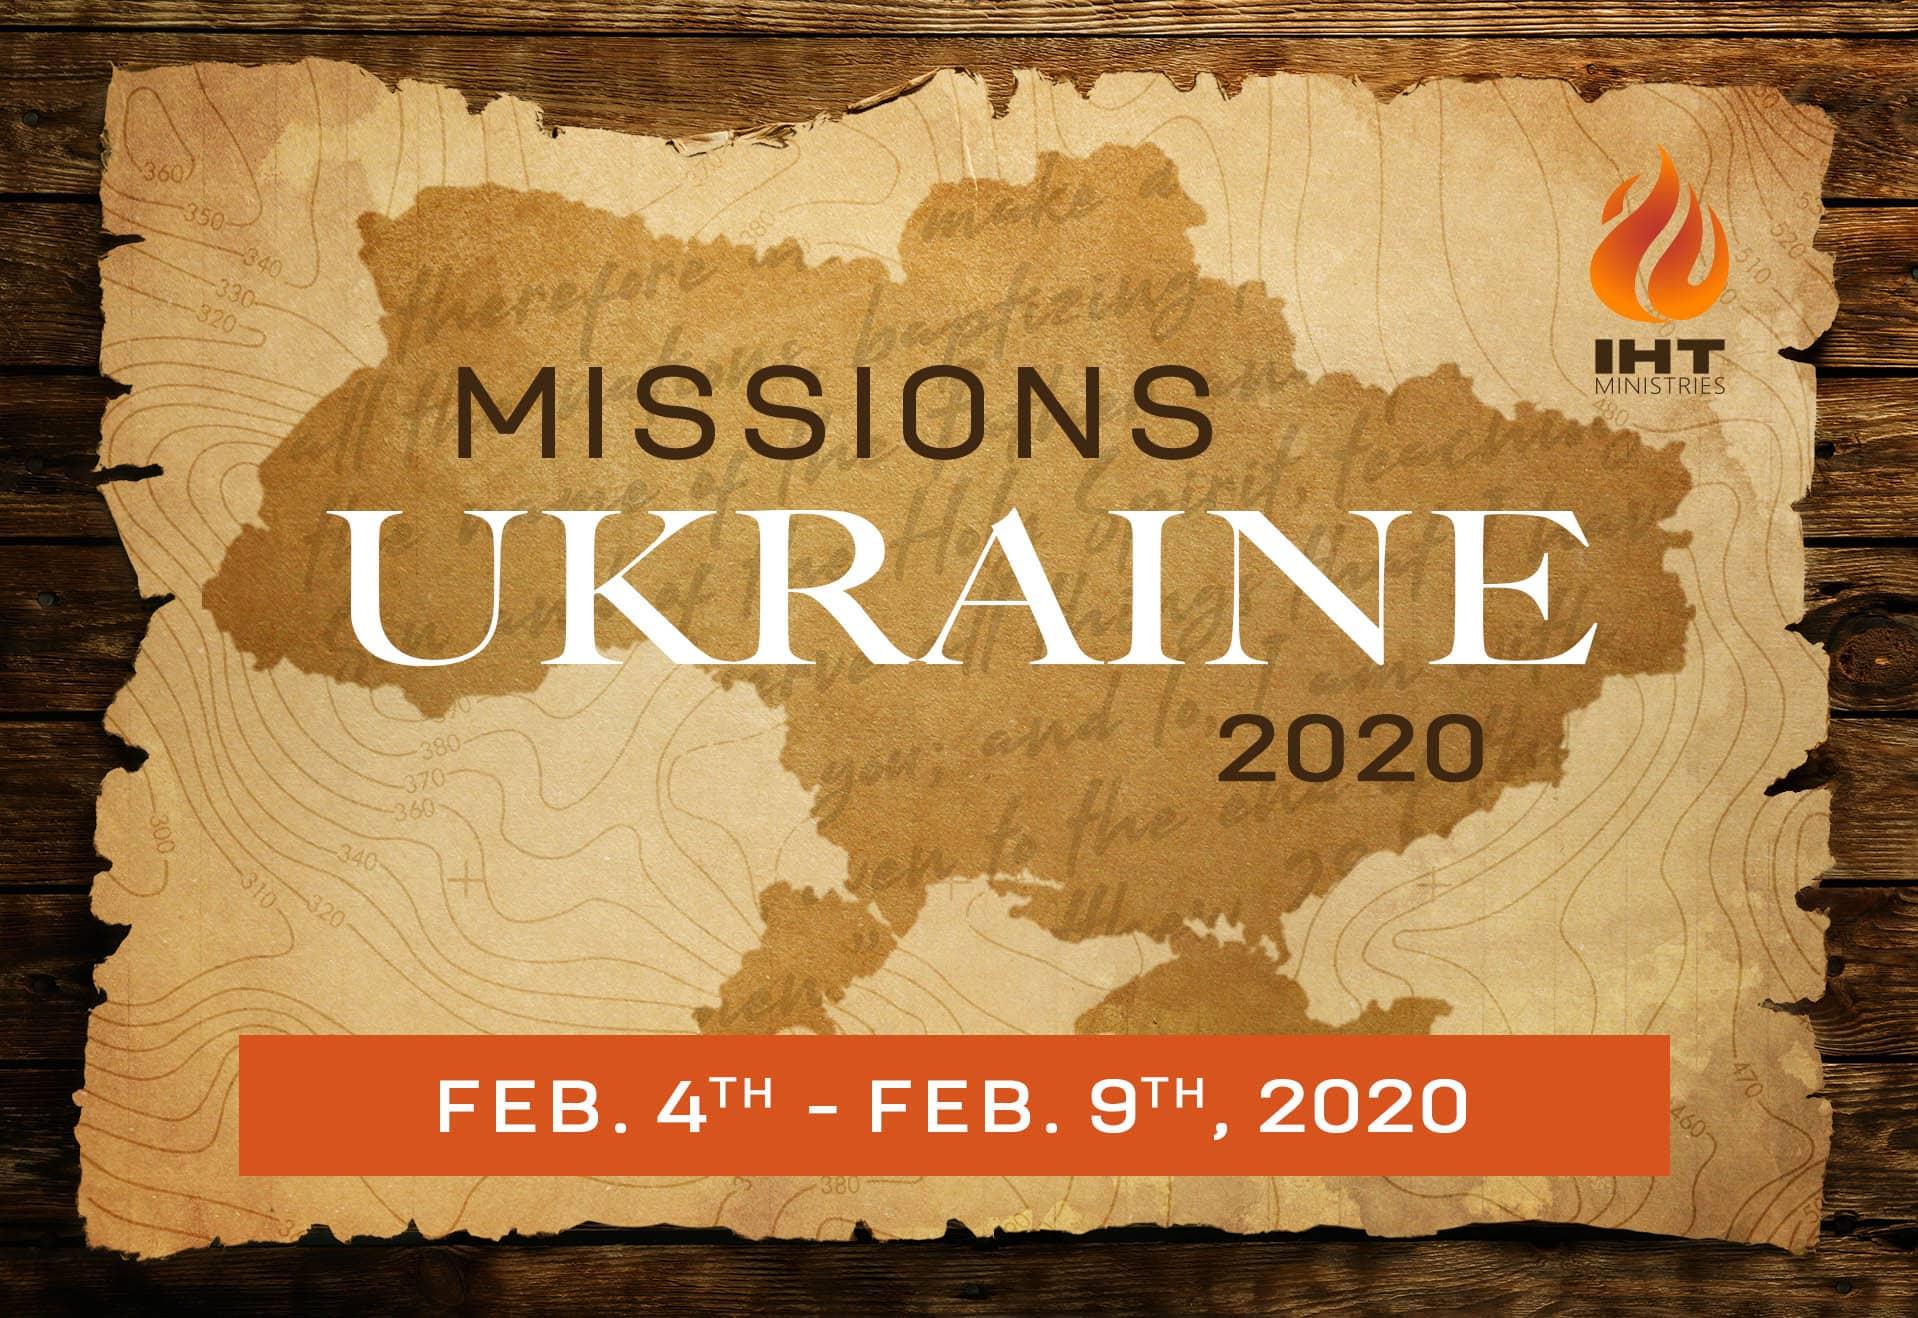 Ukraine Missions 2020